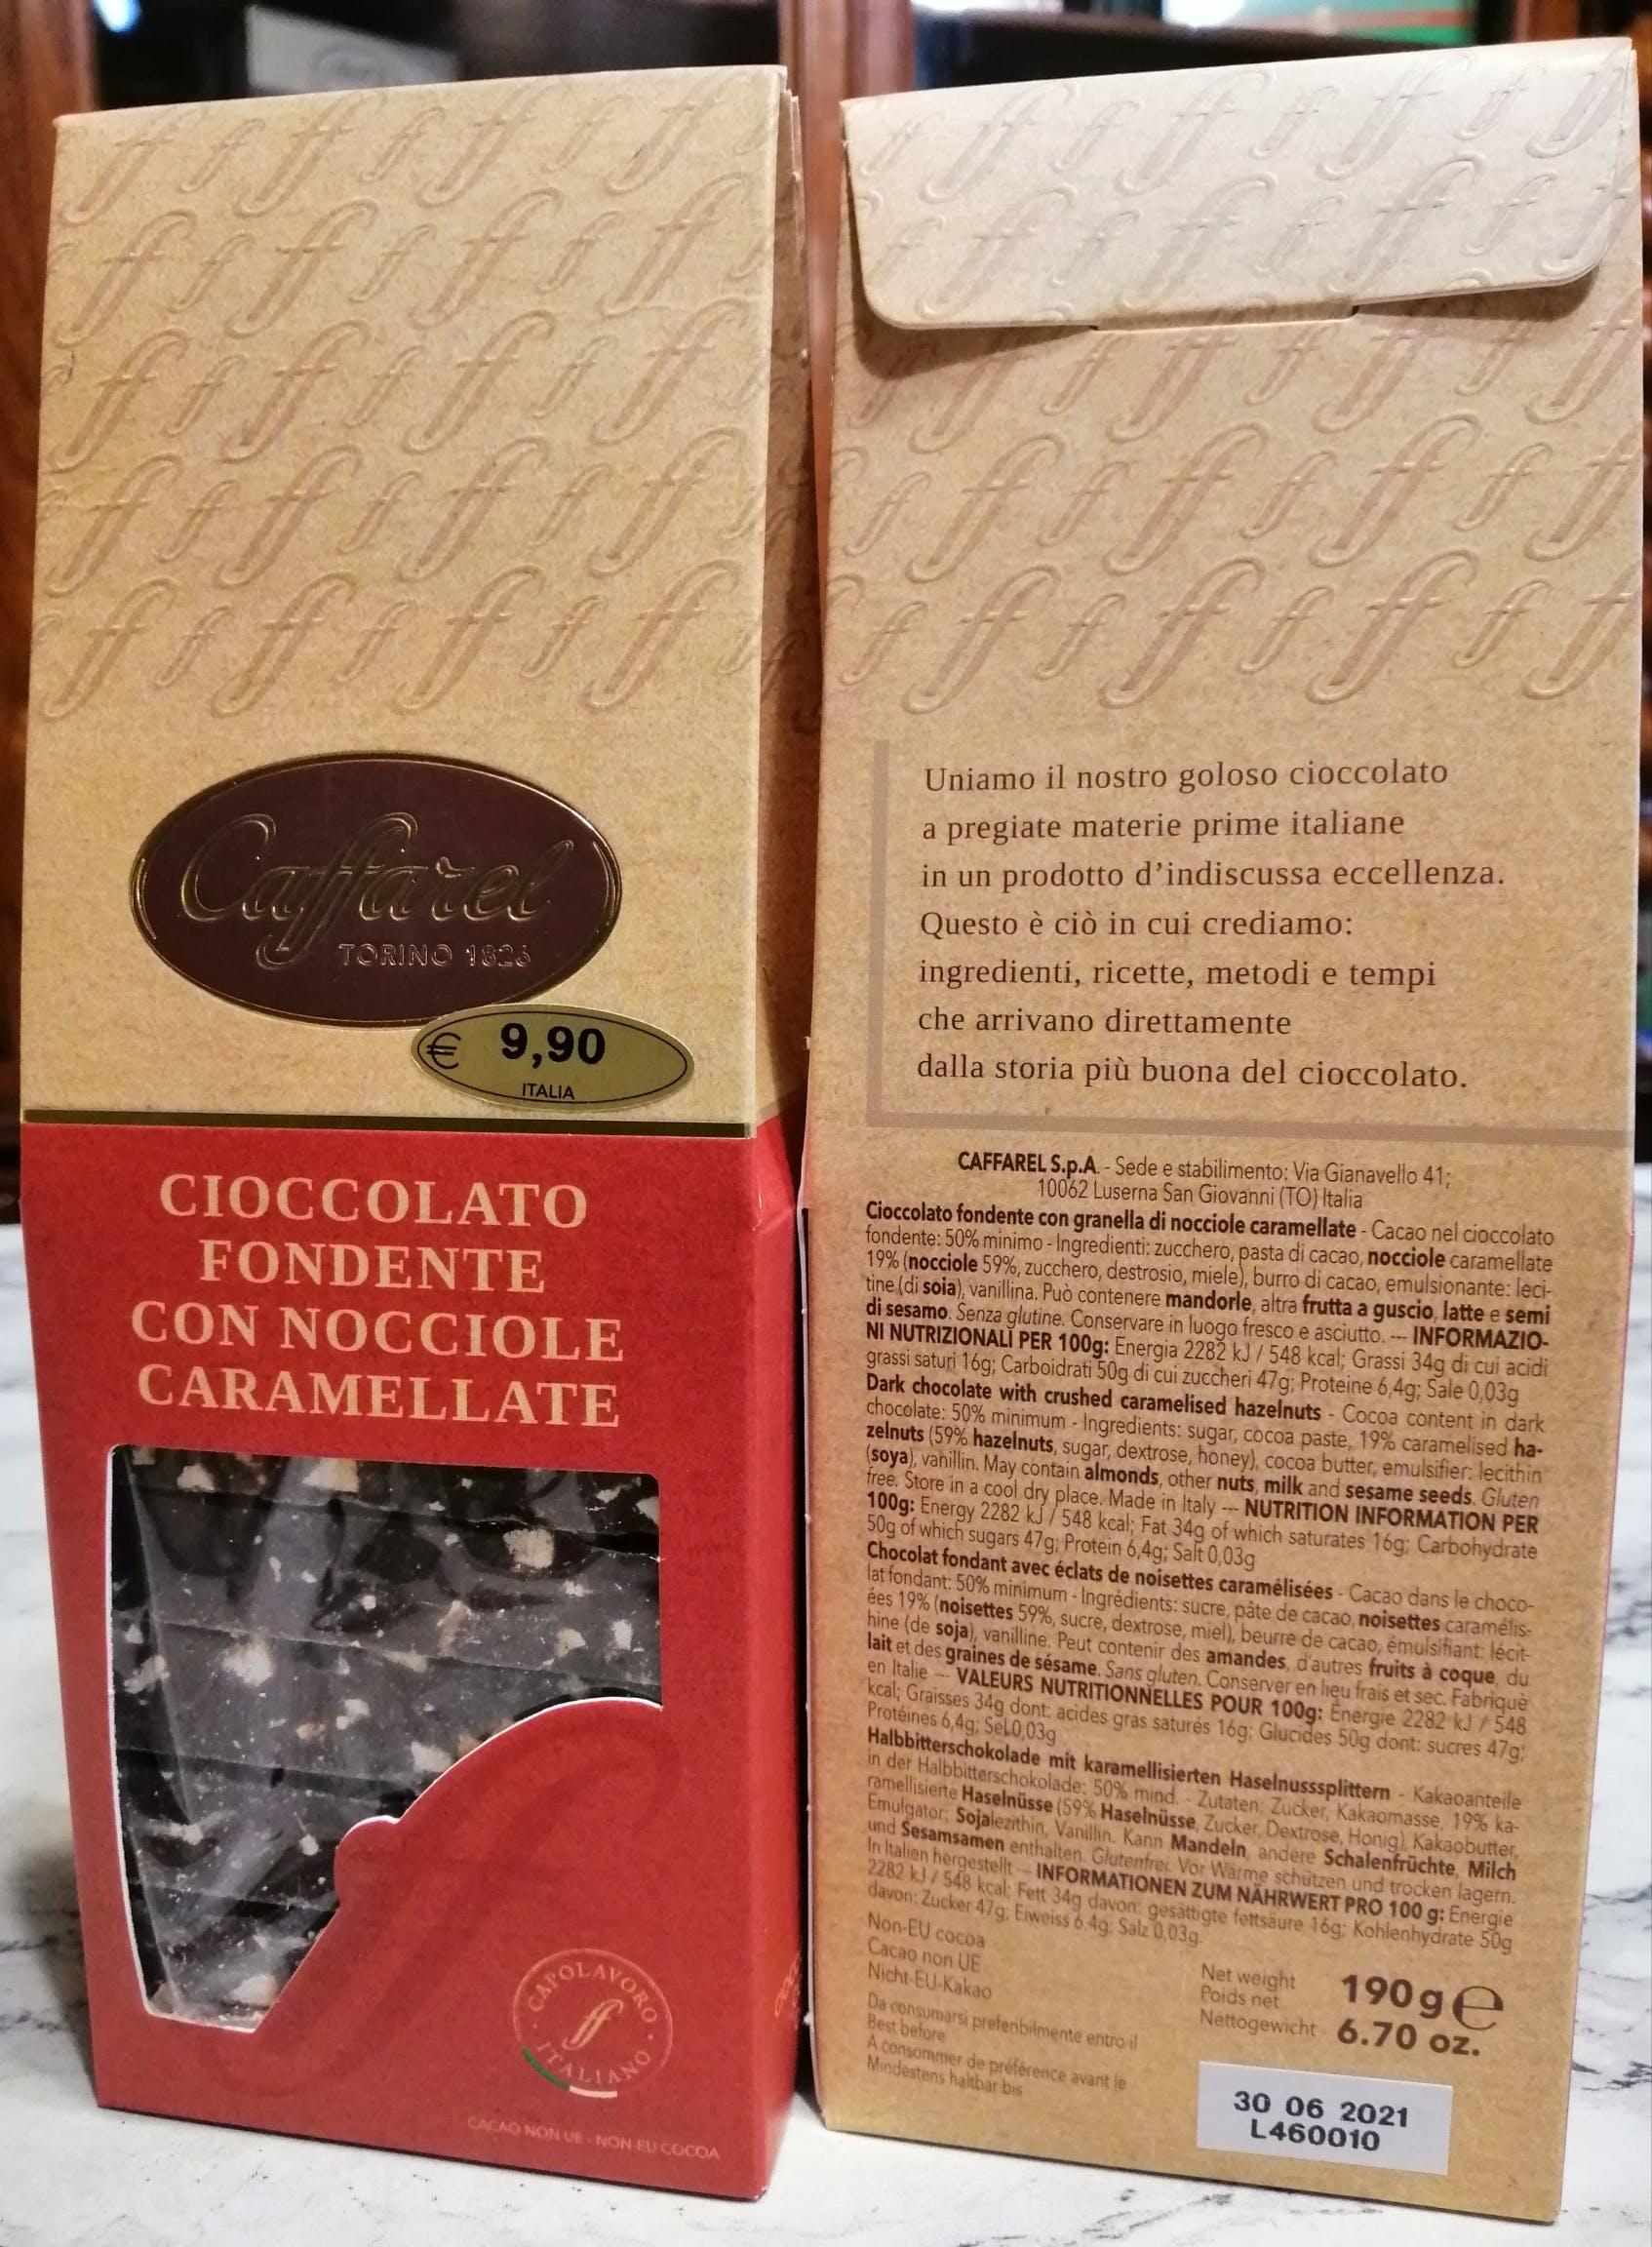 Caffarel, Cioccolato fondente con nocciole caramellate